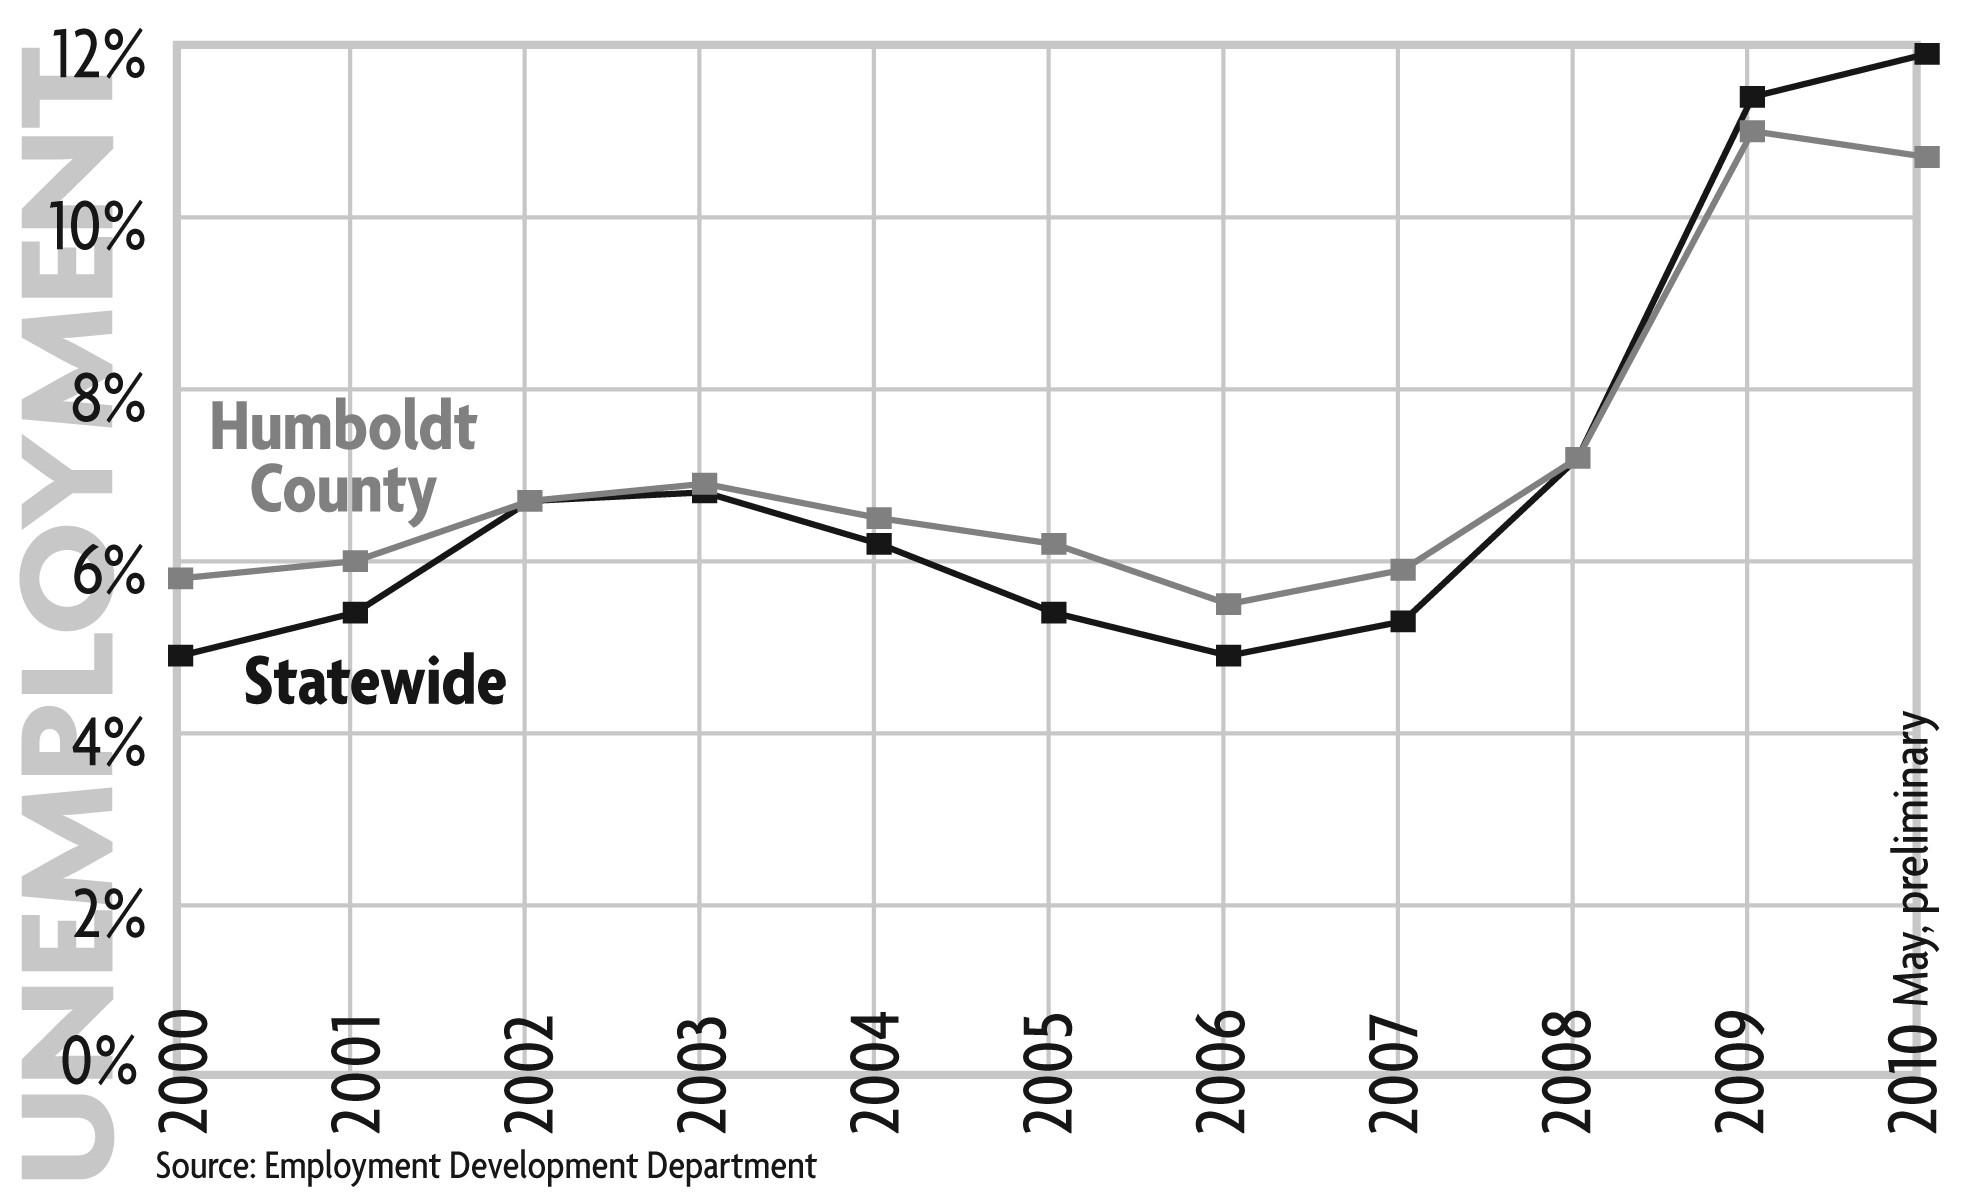 unemployment-graph-bw.jpg